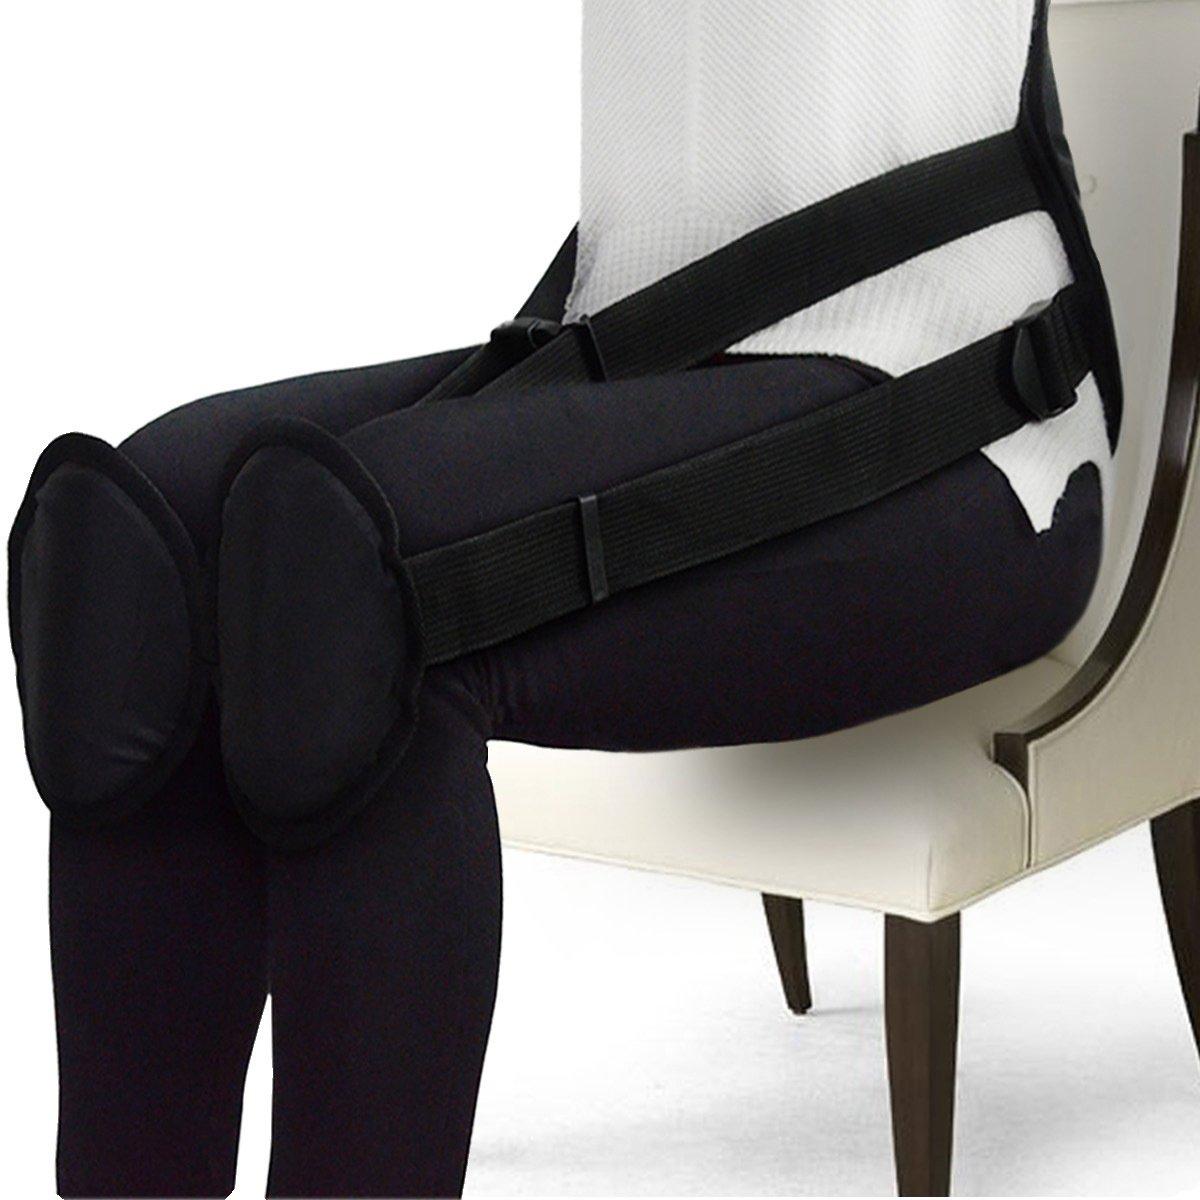 Ueasy Adjustable Back Posture Corrector Brace Clavicle Brace Portable Correct Back Posture for Correction Posture Enhance Temperament by Ueasy (Image #2)